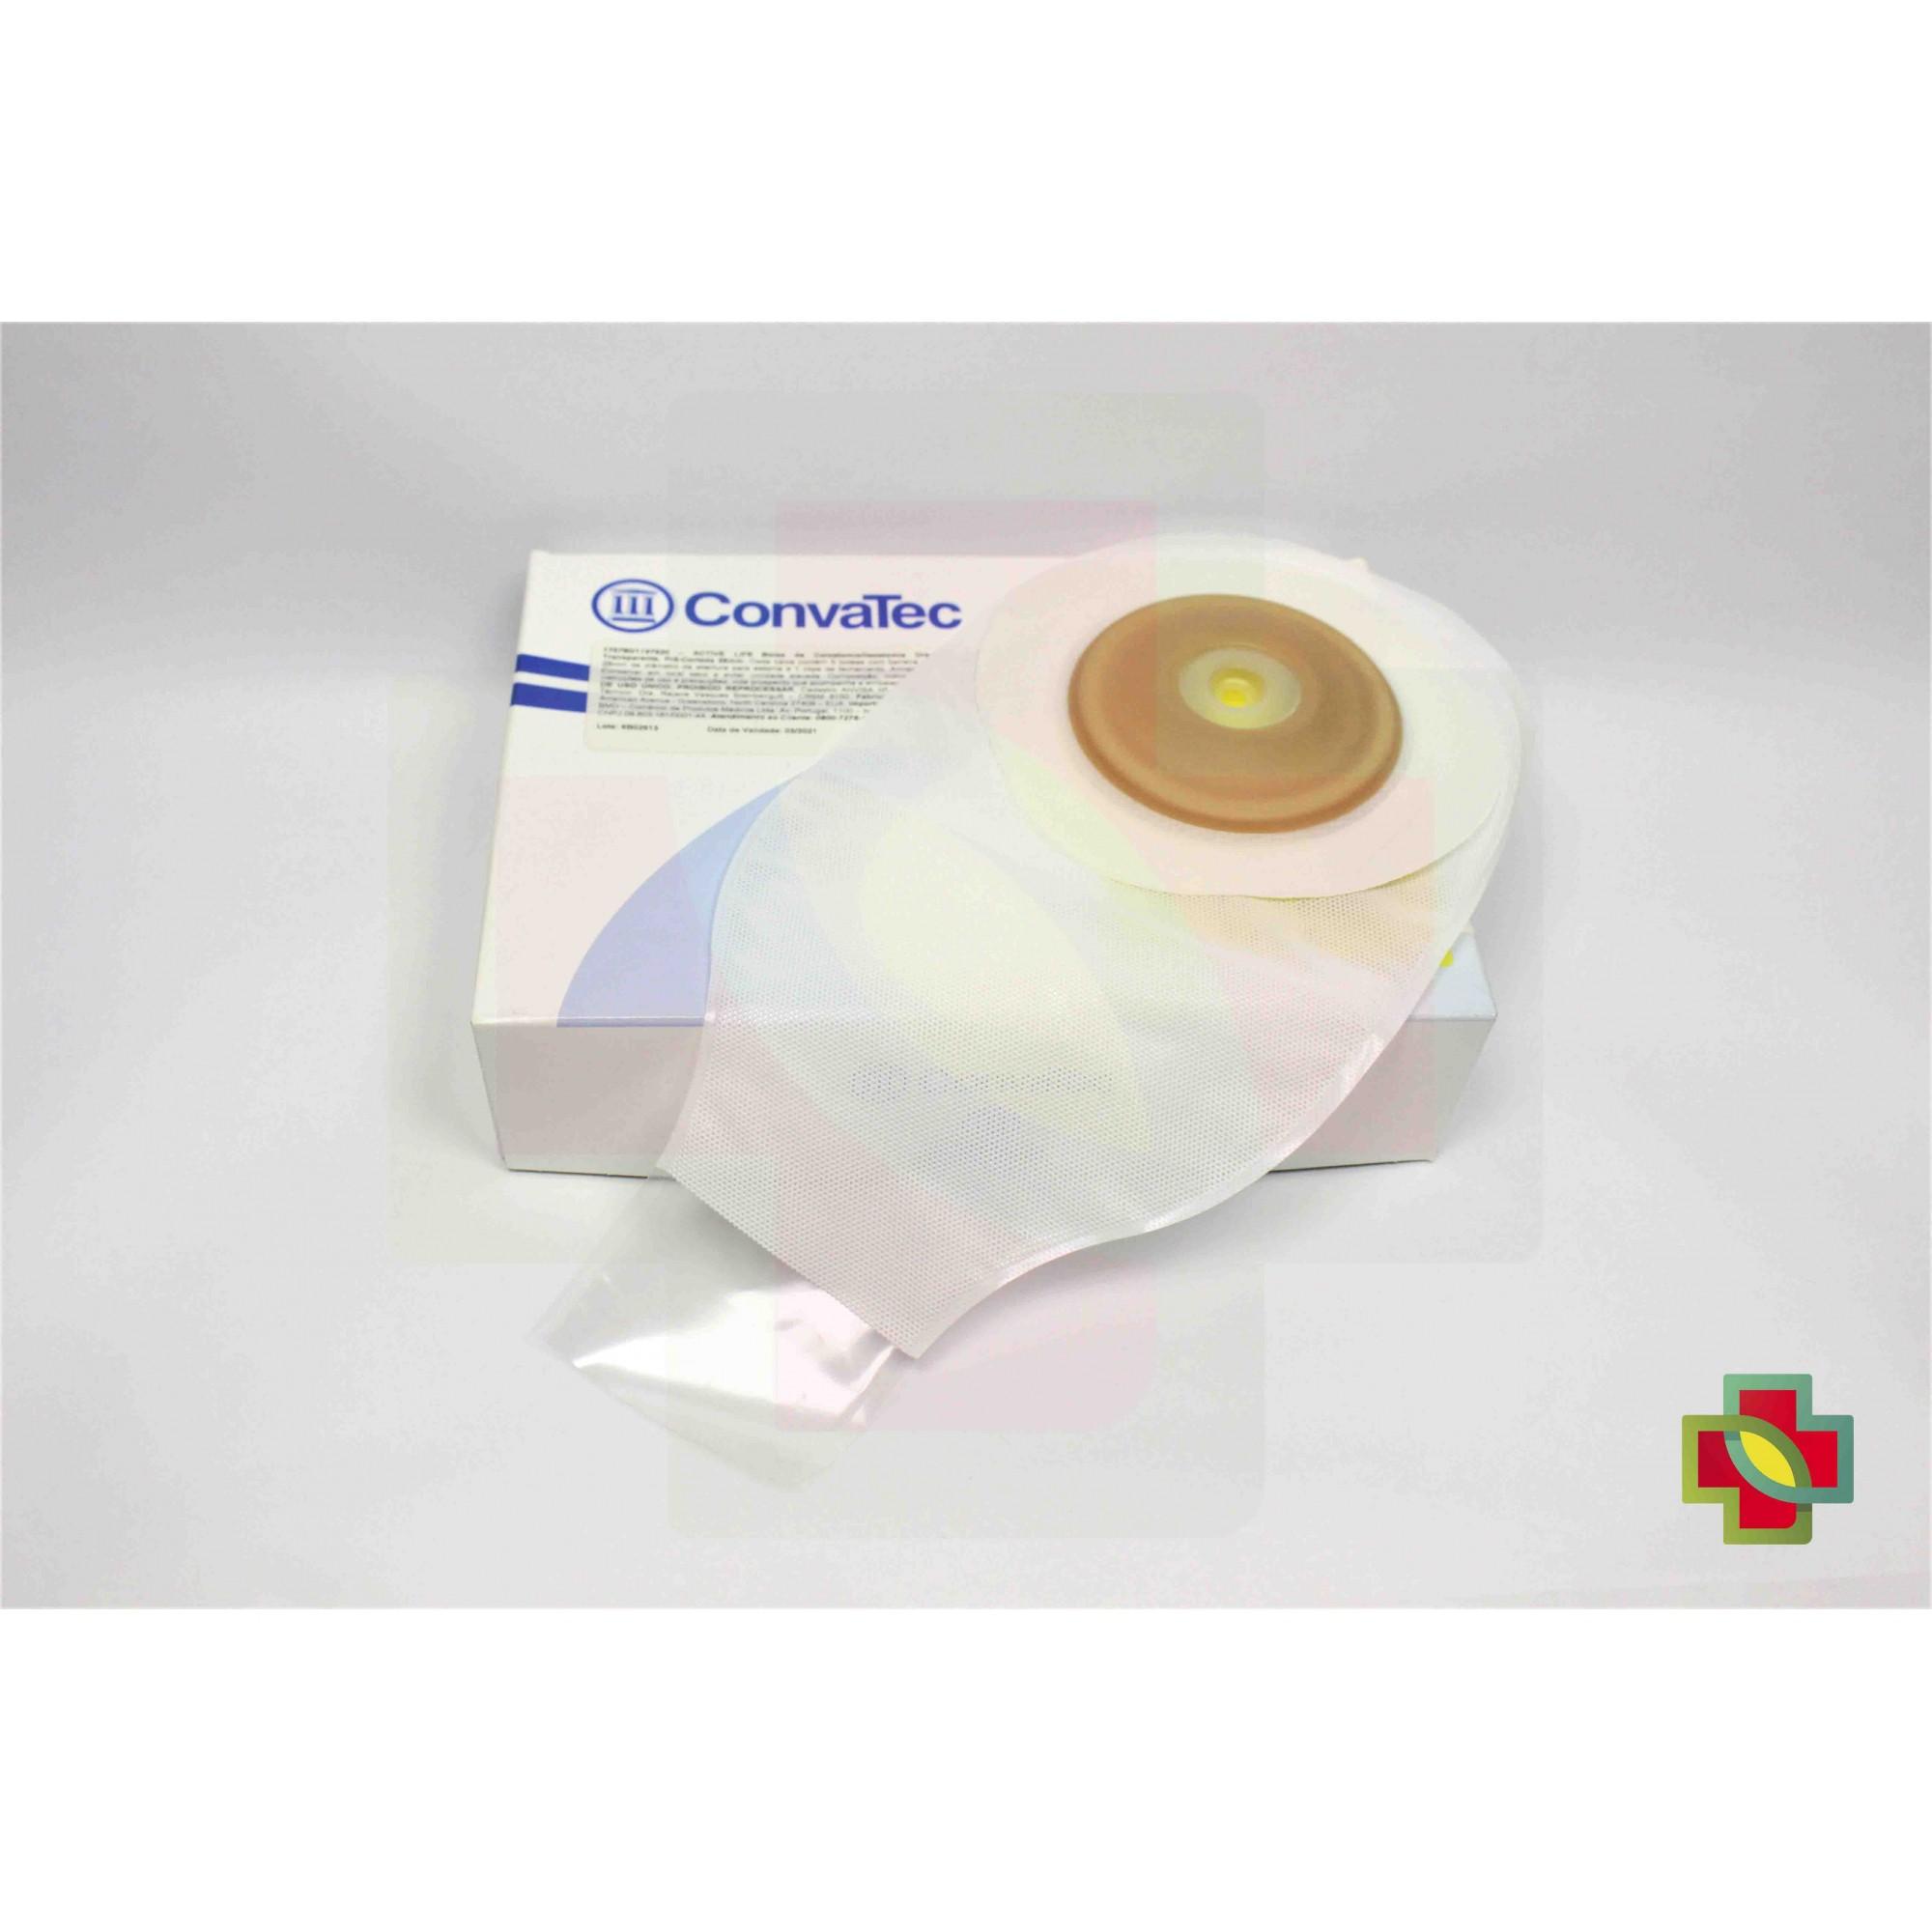 BOLSA DE COLOSTOMIA ACTIVE-LIFE 1 PEÇA CONVEXA TRANSP 28MM UND.175780 CONVATEC